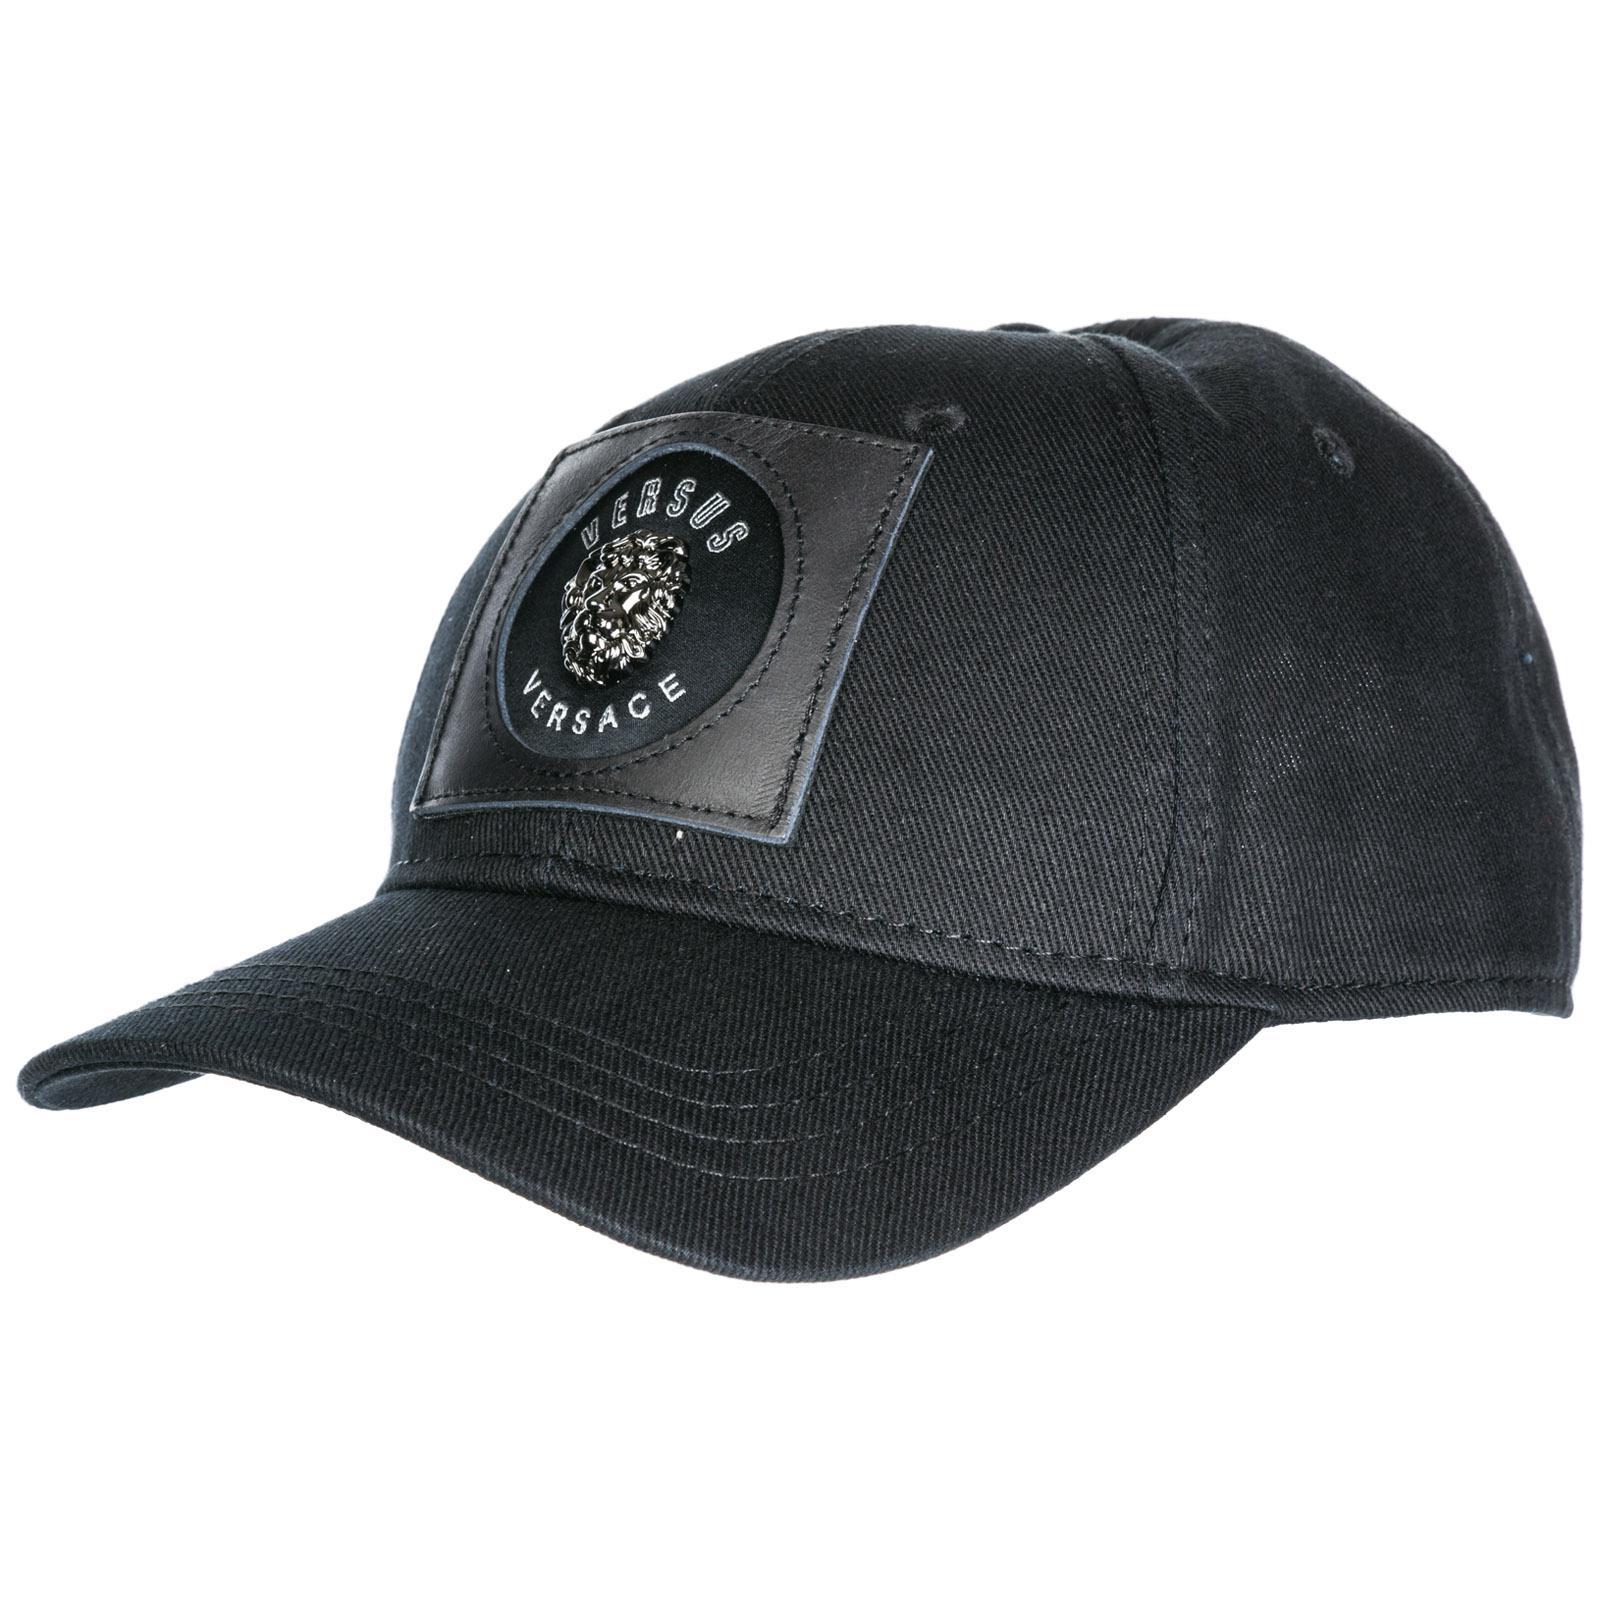 006136a106b Versus - Black Adjustable Cotton Hat Baseball Cap for Men - Lyst. View  fullscreen